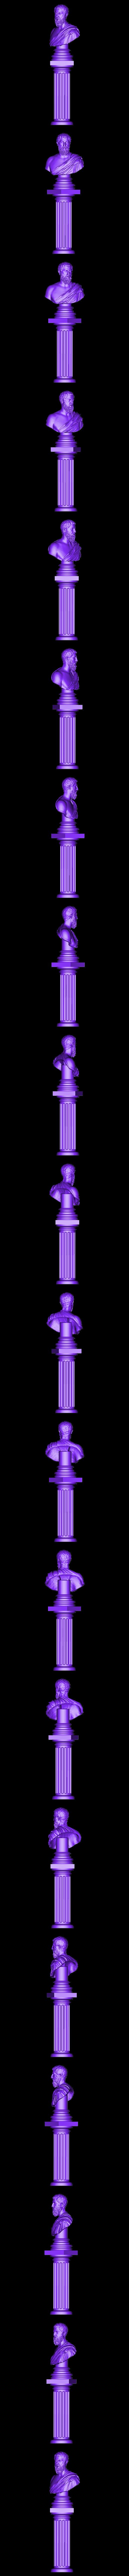 ´Roman_Bust.stl Download free OBJ file Roman Bust 3D Model • 3D print object, DavidG7